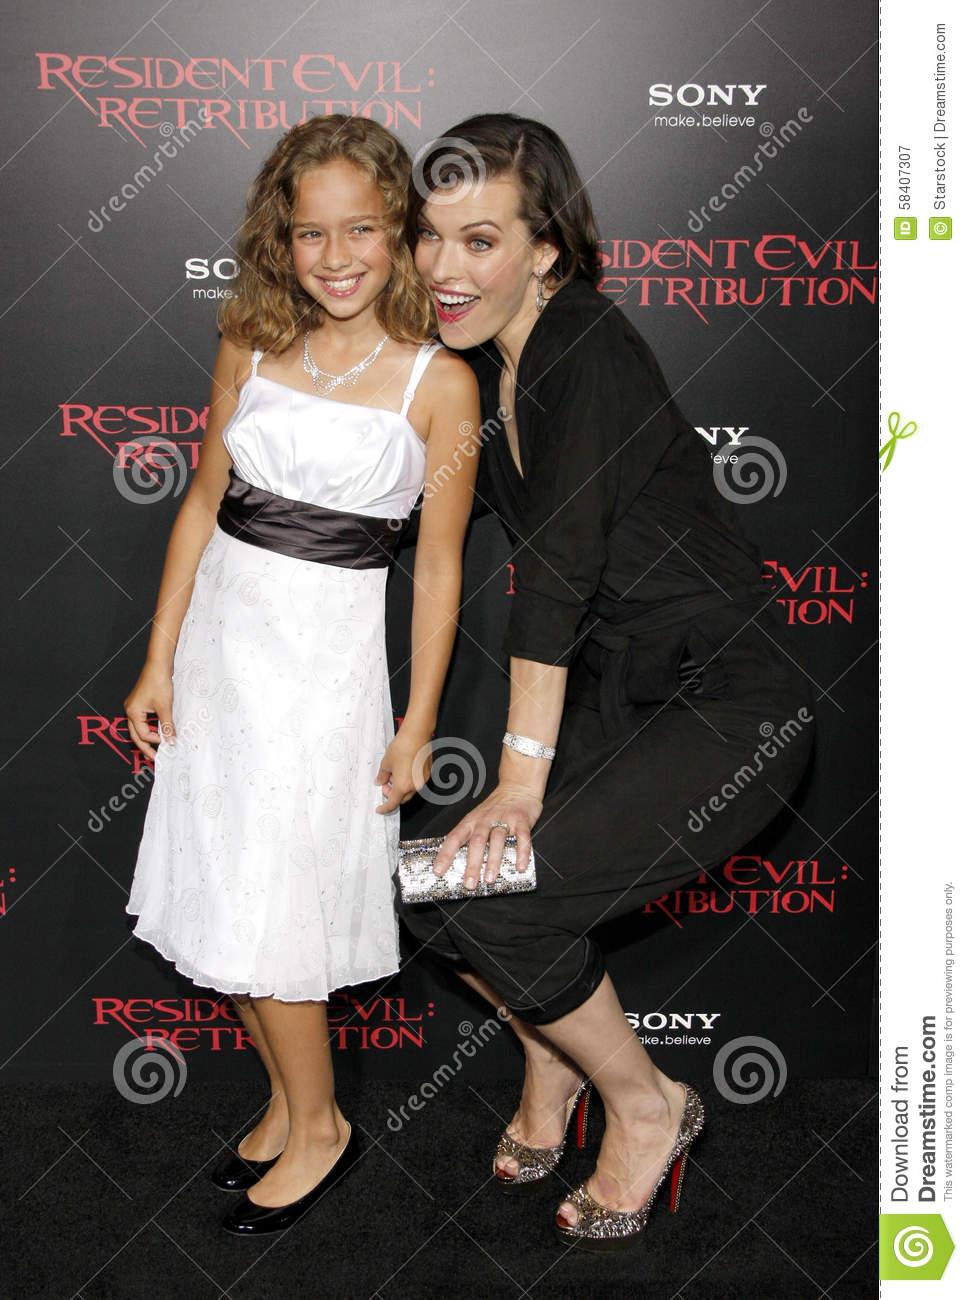 Milla Jovovich And Aryana Engineer Edito-Milla Jovovich And Aryana Engineer Editorial Photography - Image of  hollywood, premiere: 58407307-10